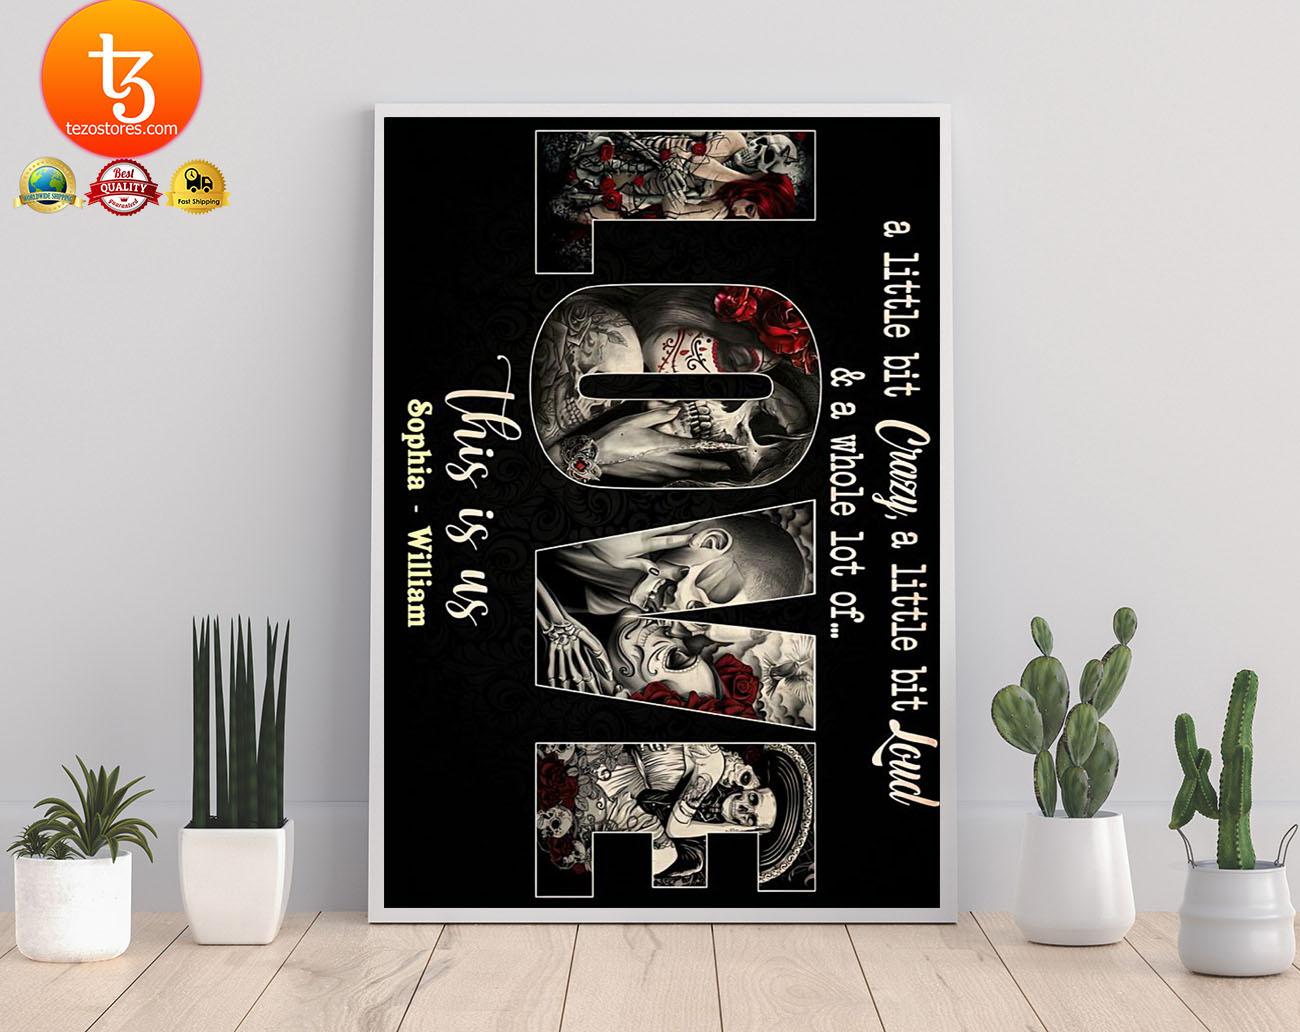 Sugar skull a little bit crazy a little bit loud and a whole lot of poster 21